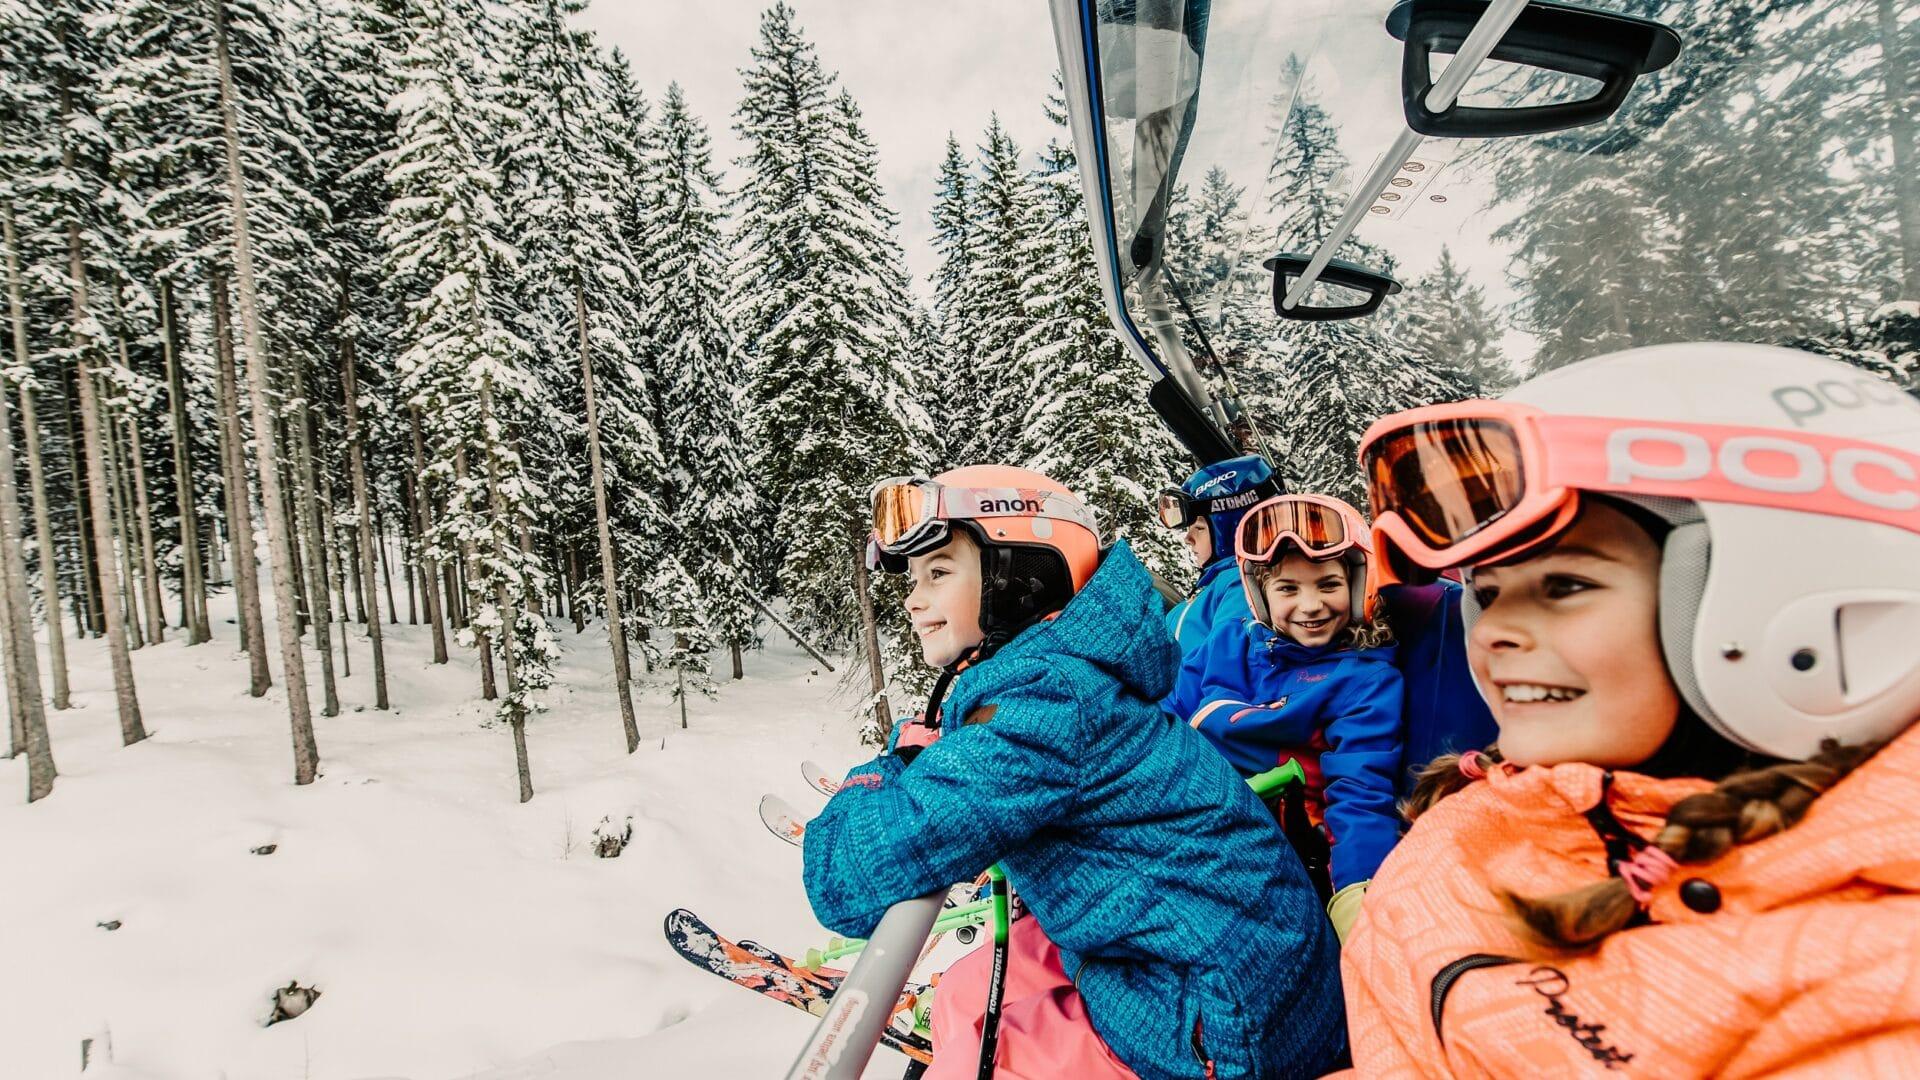 Hofgut-apartment-&-lifestyle-resort-wagrain-winter-freiheitspürenalsfamilie-skiamade-skifahren